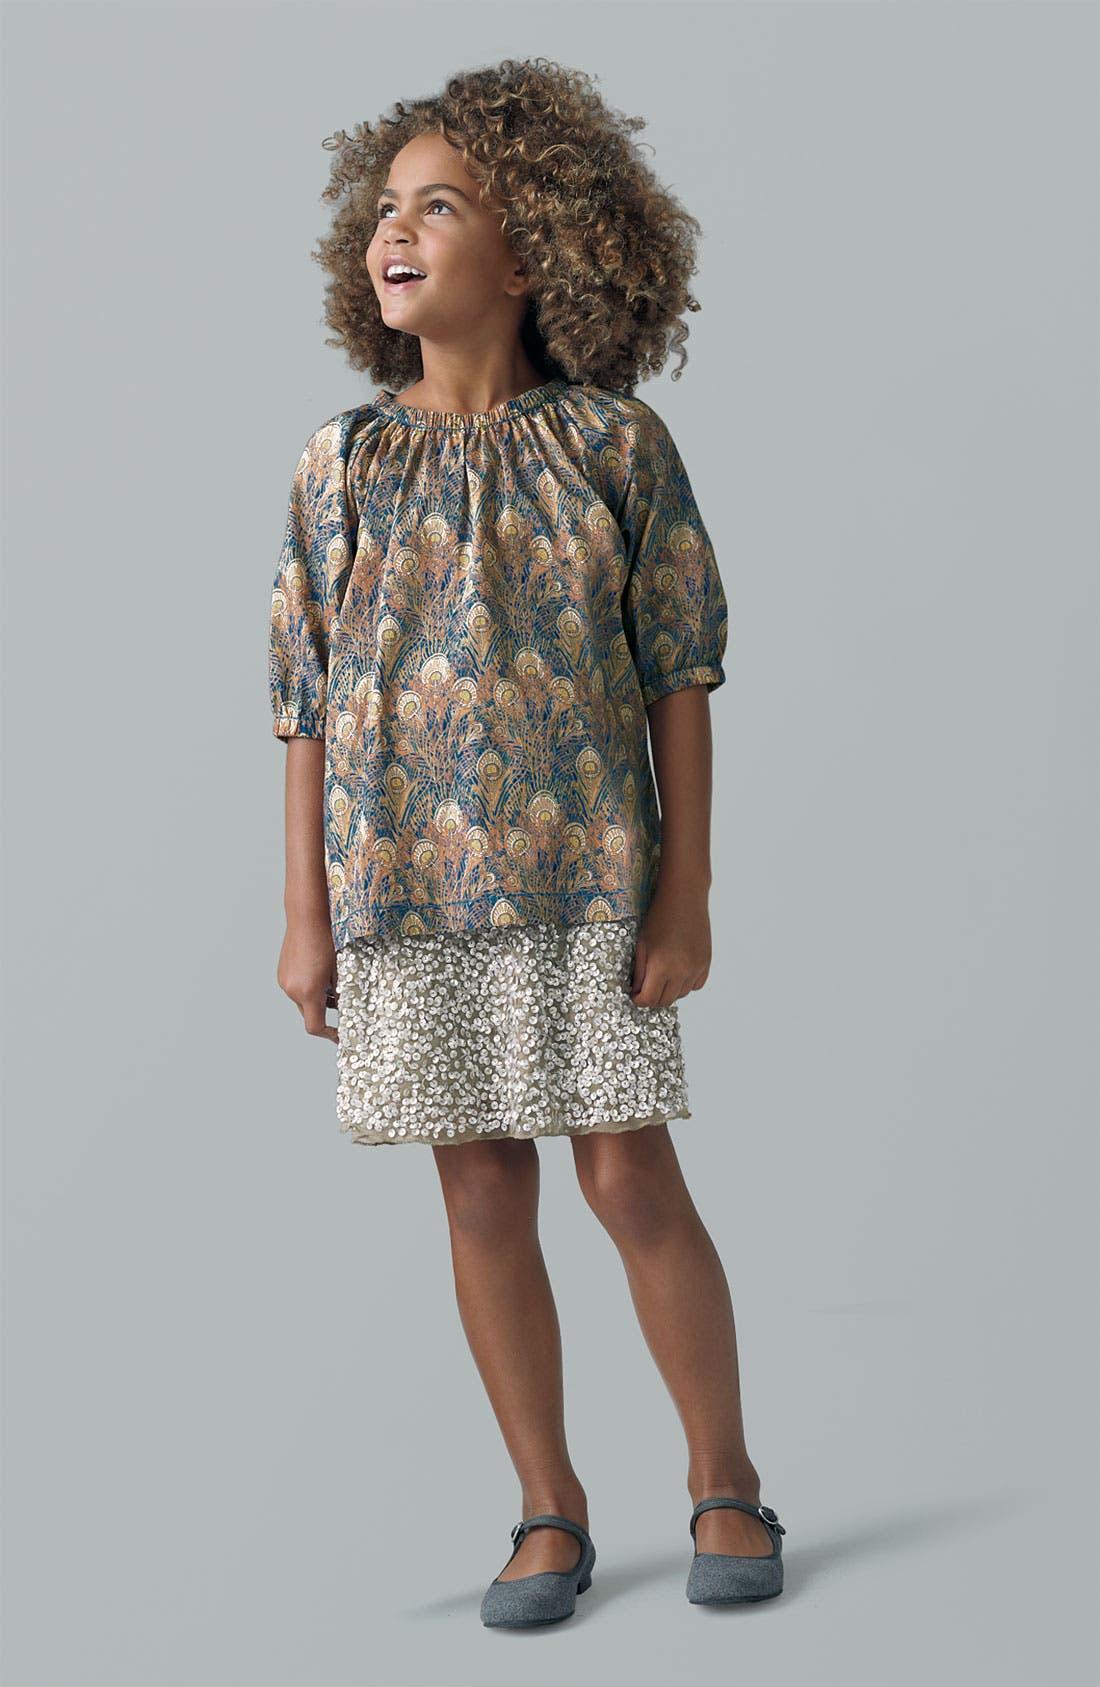 Main Image - Peek Top & Sequin Skirt (Toddler, Little Girls & Big Girls)